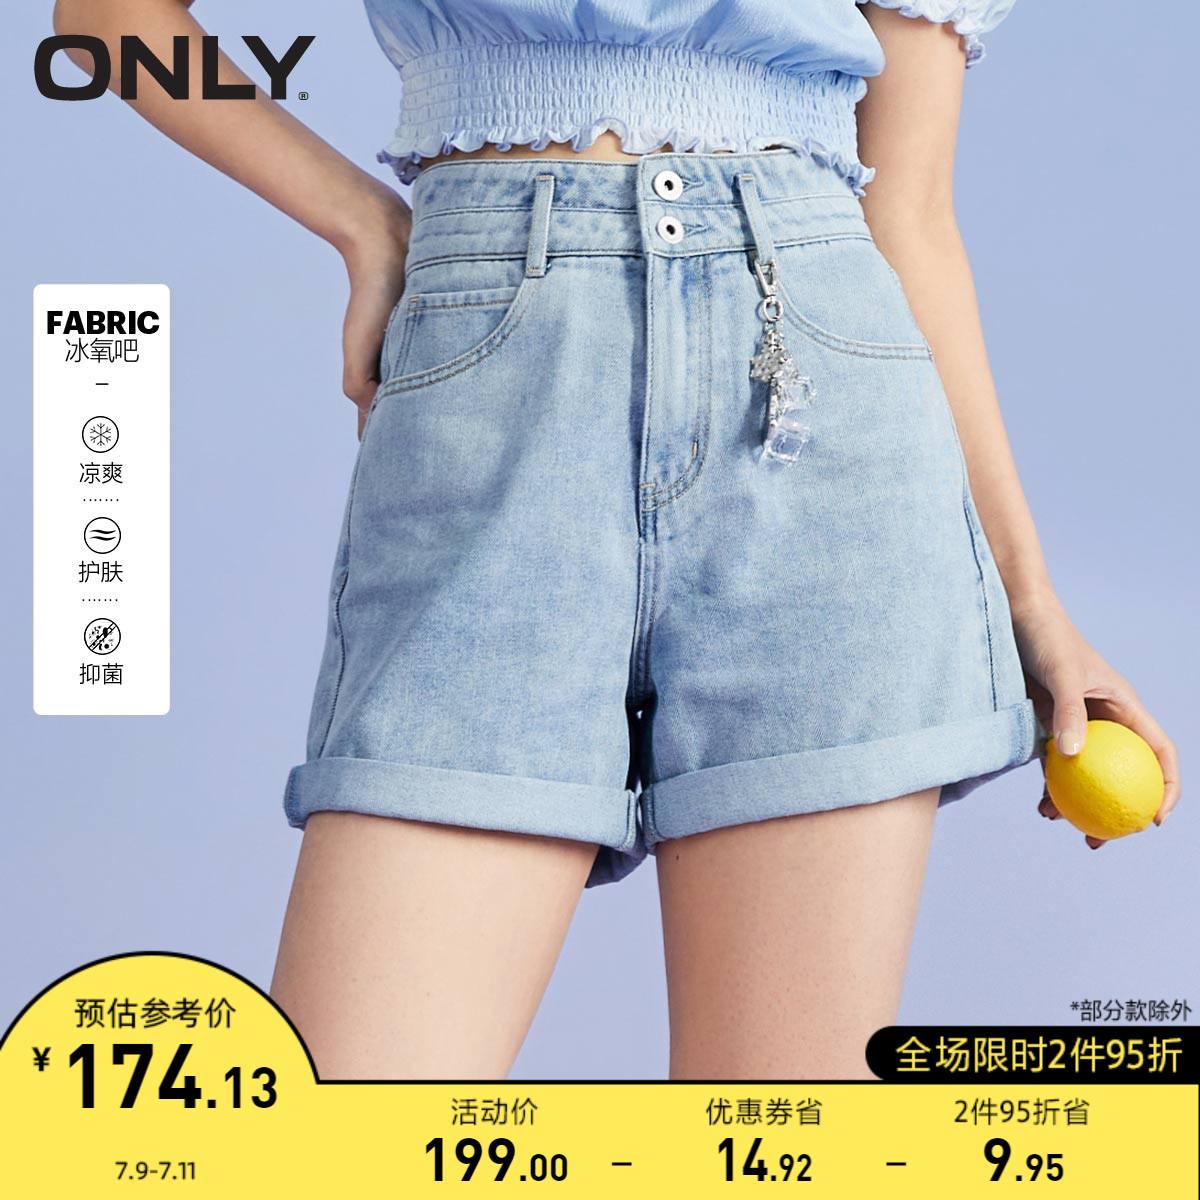 ONLY2021夏季新款冰氧吧清凉薄款高腰显瘦短裤牛仔裤女 121243004